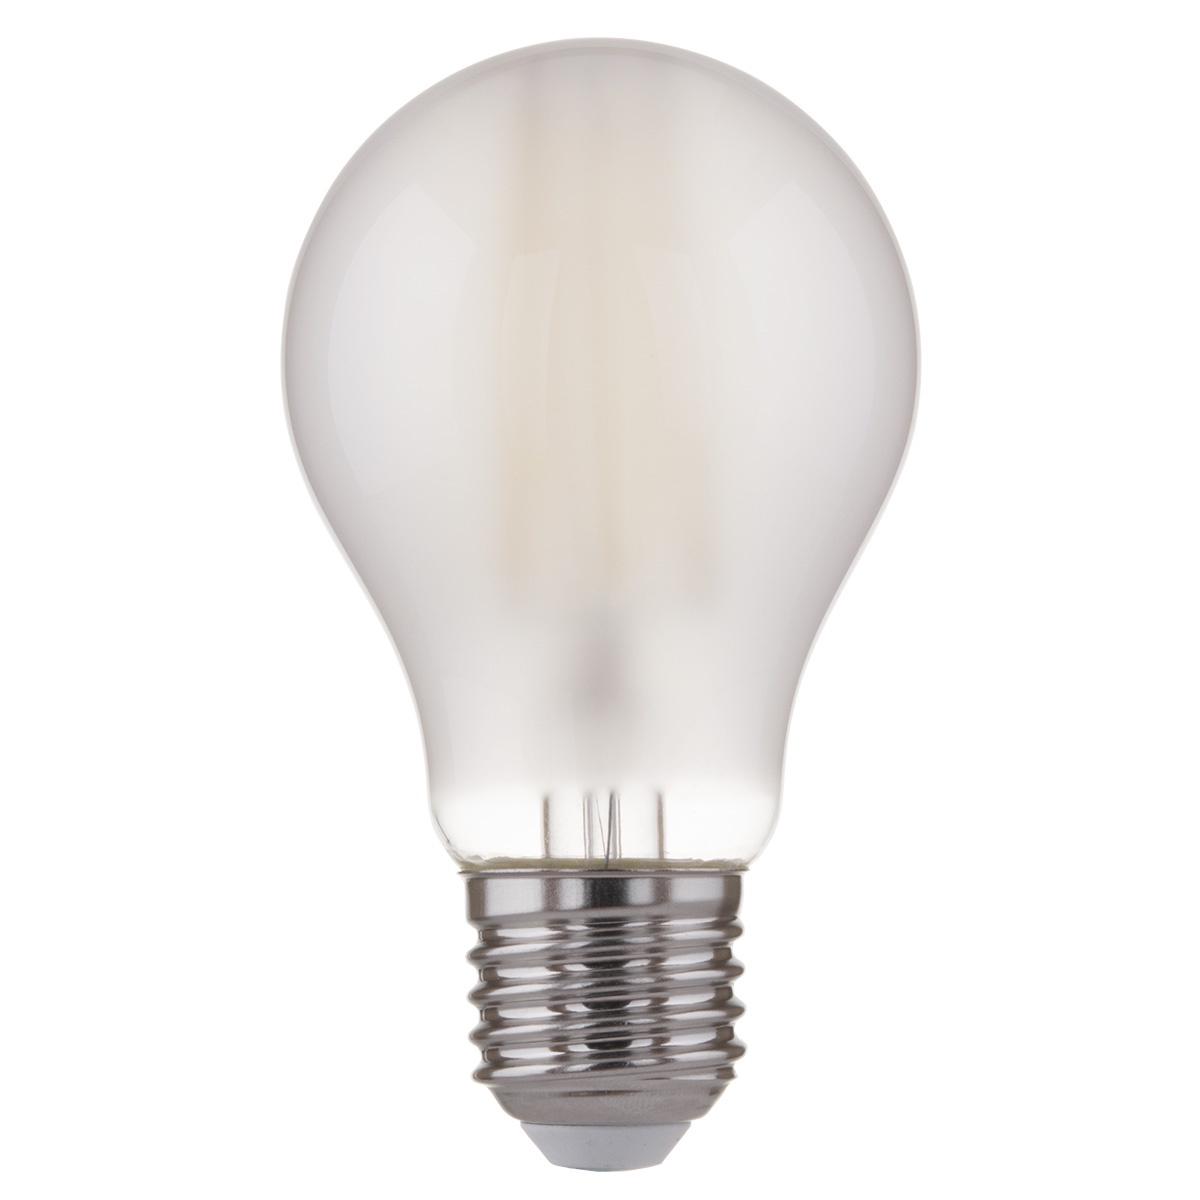 elektrostandard лампа светодиодная elektrostandard classic led d 10w 4200k e27 4690389085543 Лампочка Elektrostandard светодиодная Classic LED 12W 4200K E27, Нейтральный свет 12 Вт, Светодиодная